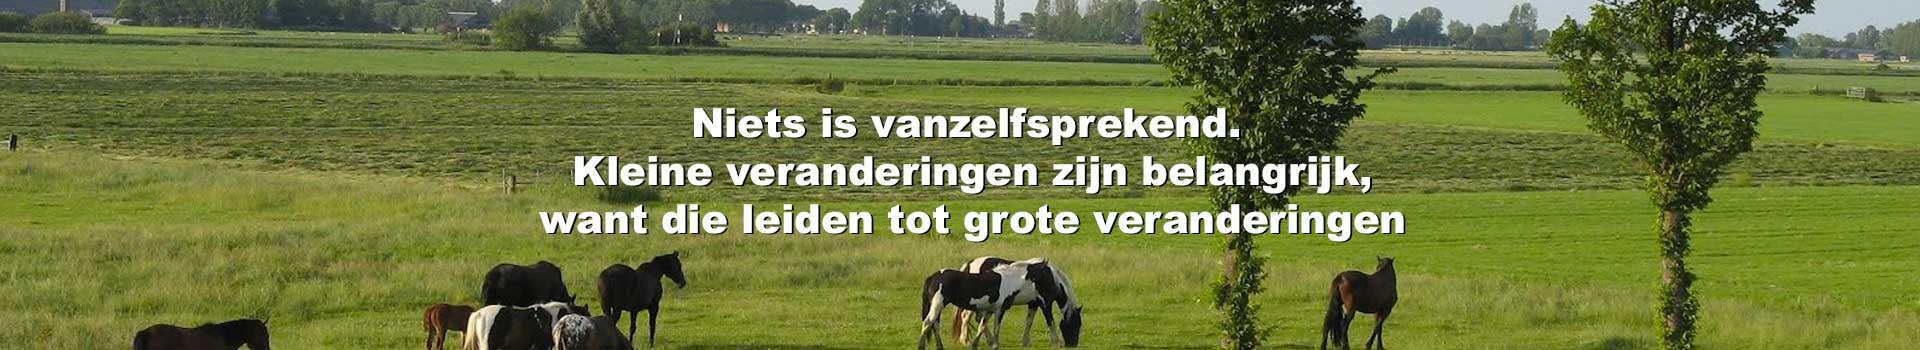 Cooperatief Nederland